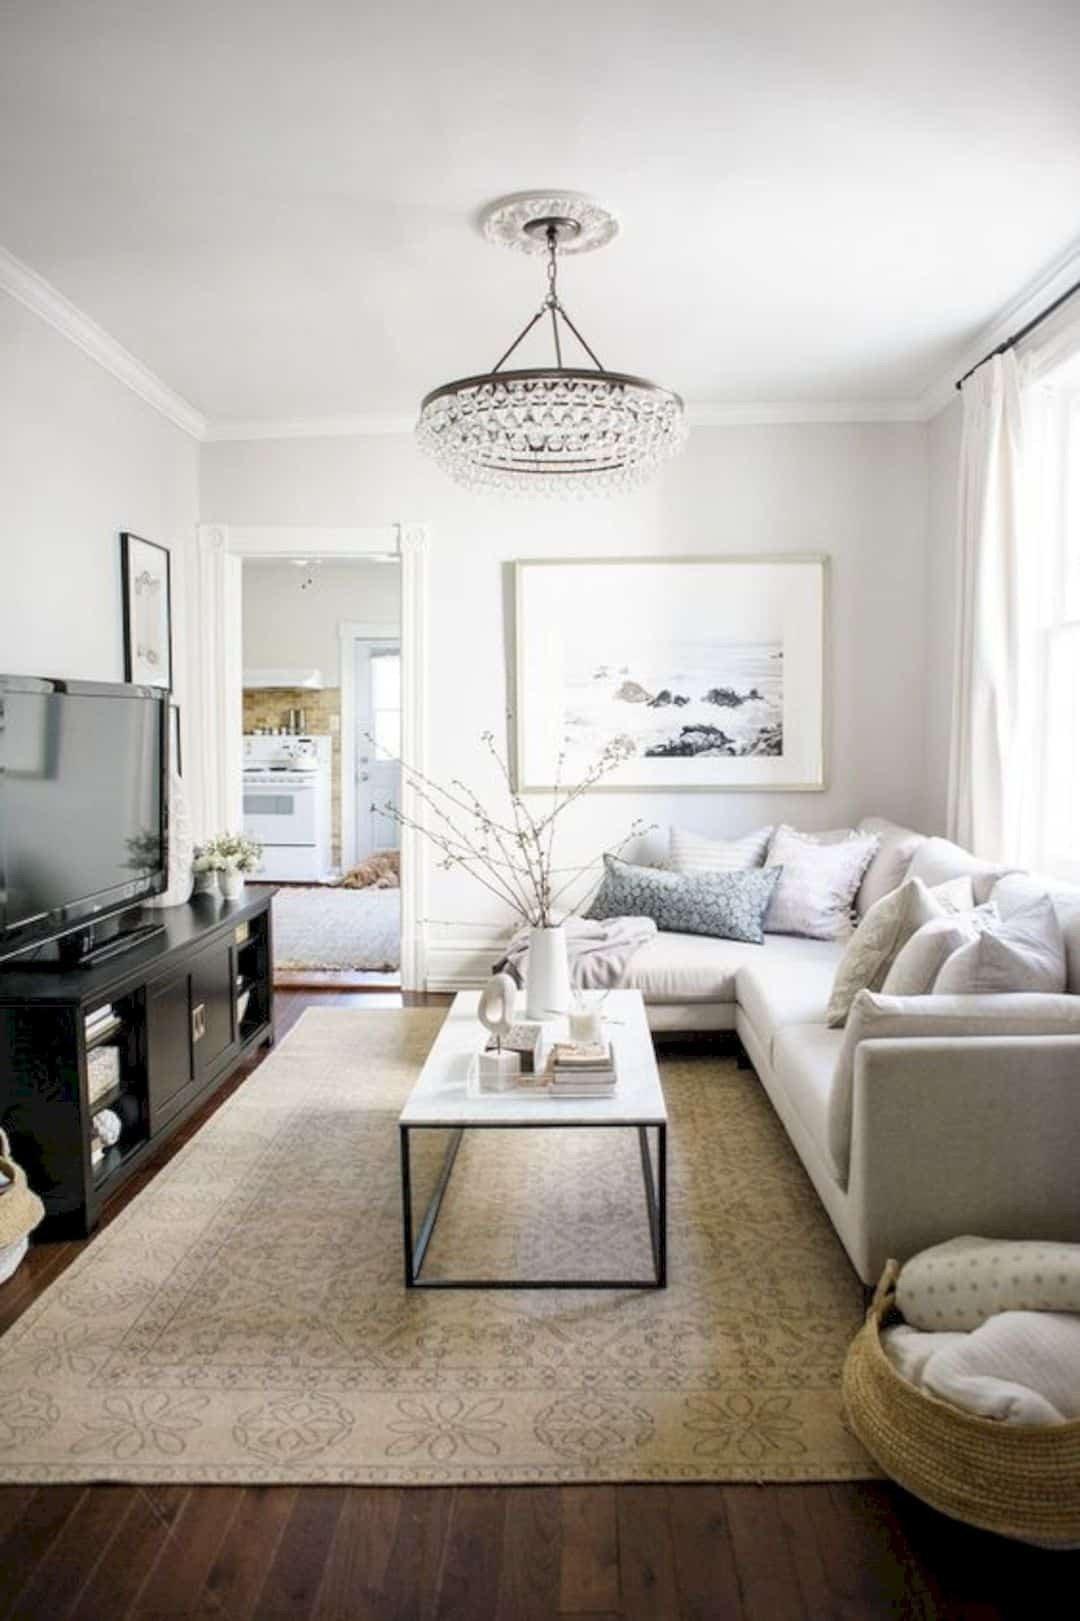 Simple Living Room Decor Ideas 16 Simple Interior Design Ideas for Living Room